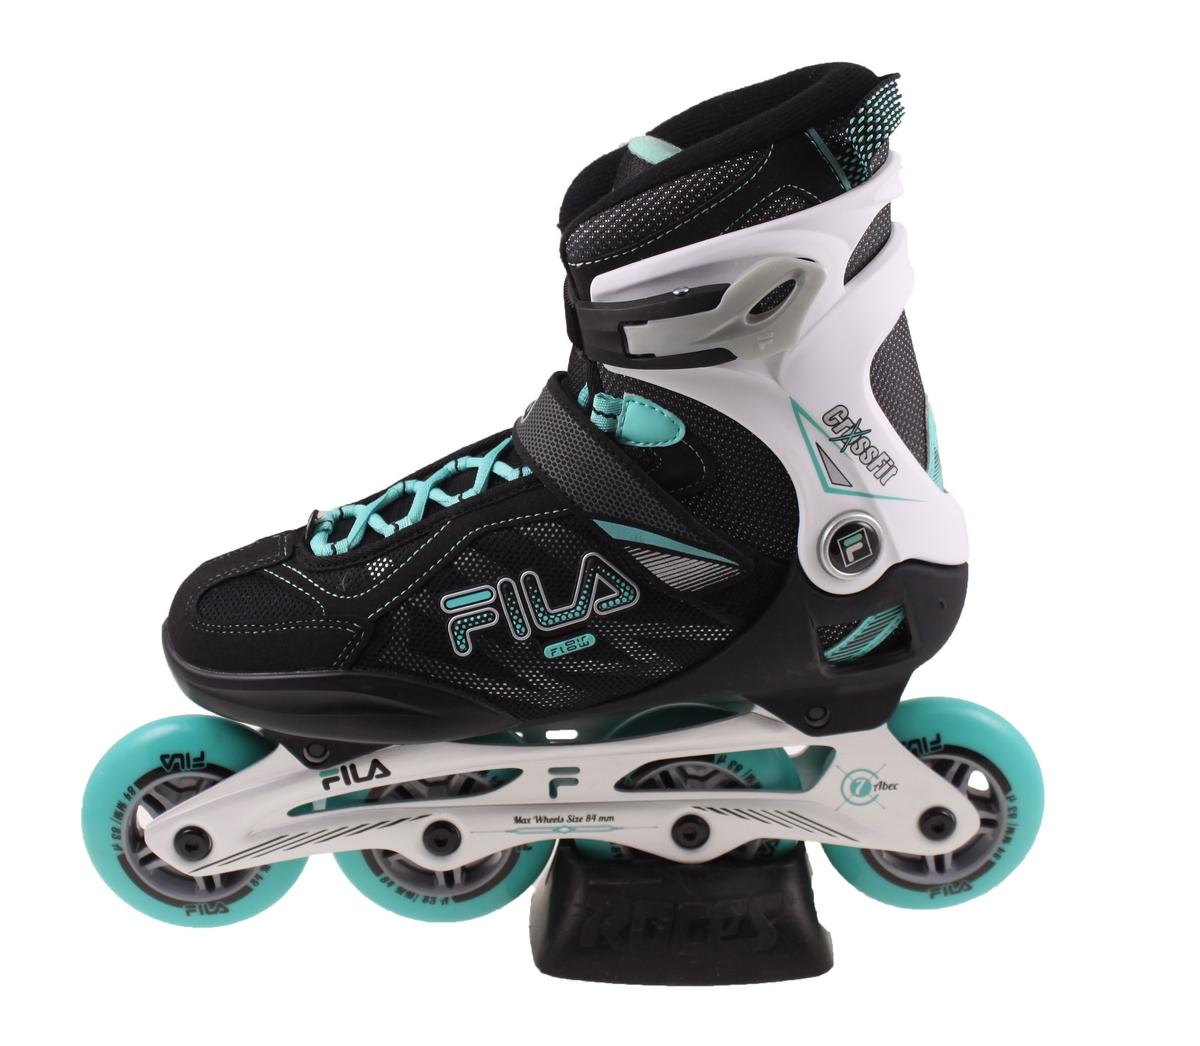 59854632d16 Fila Crossfit Dames Inline Skate ZWART online kopen bij Sportpaleis.